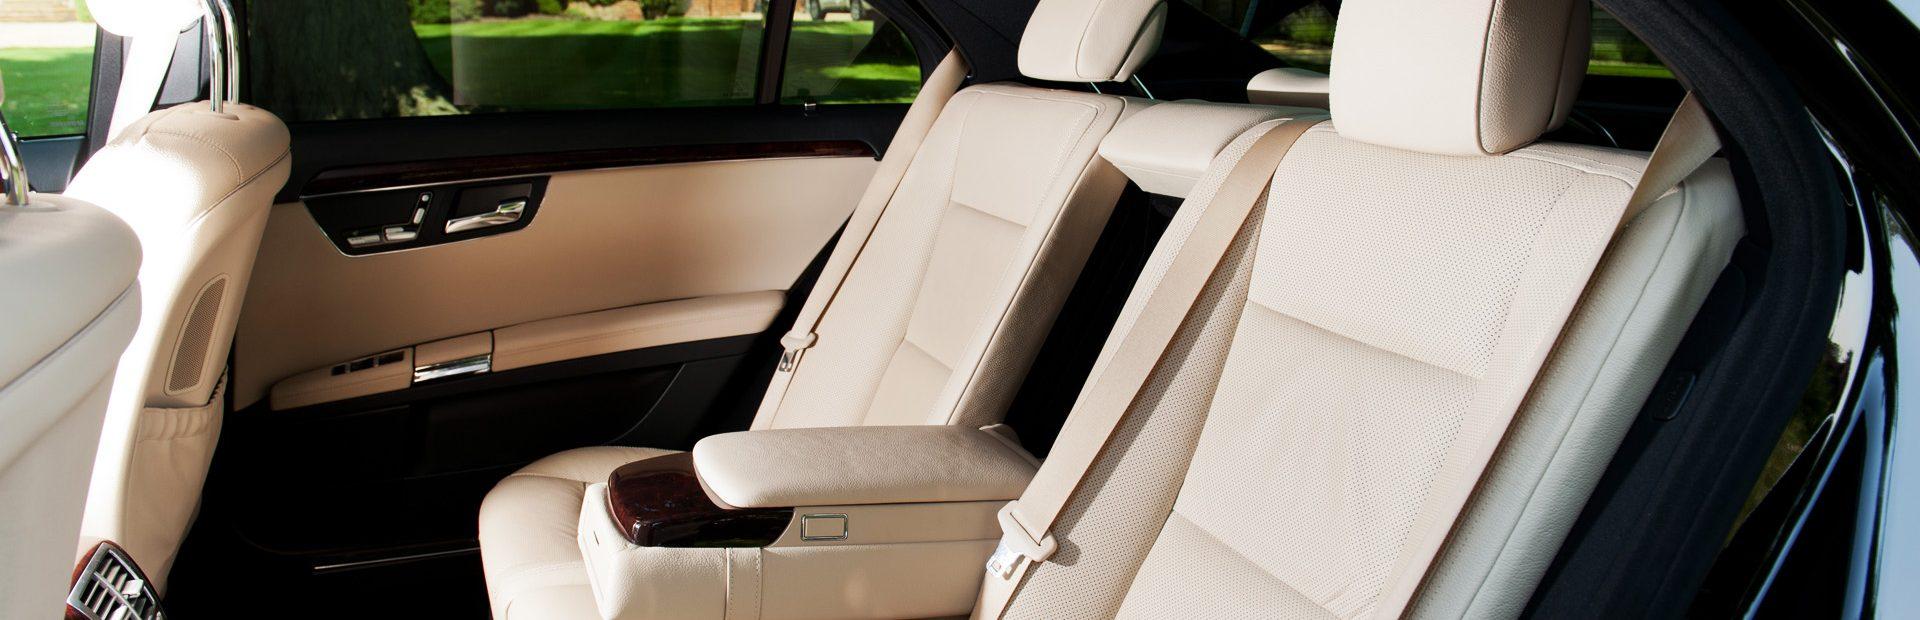 Scorpio Chauffeur cars Surrey